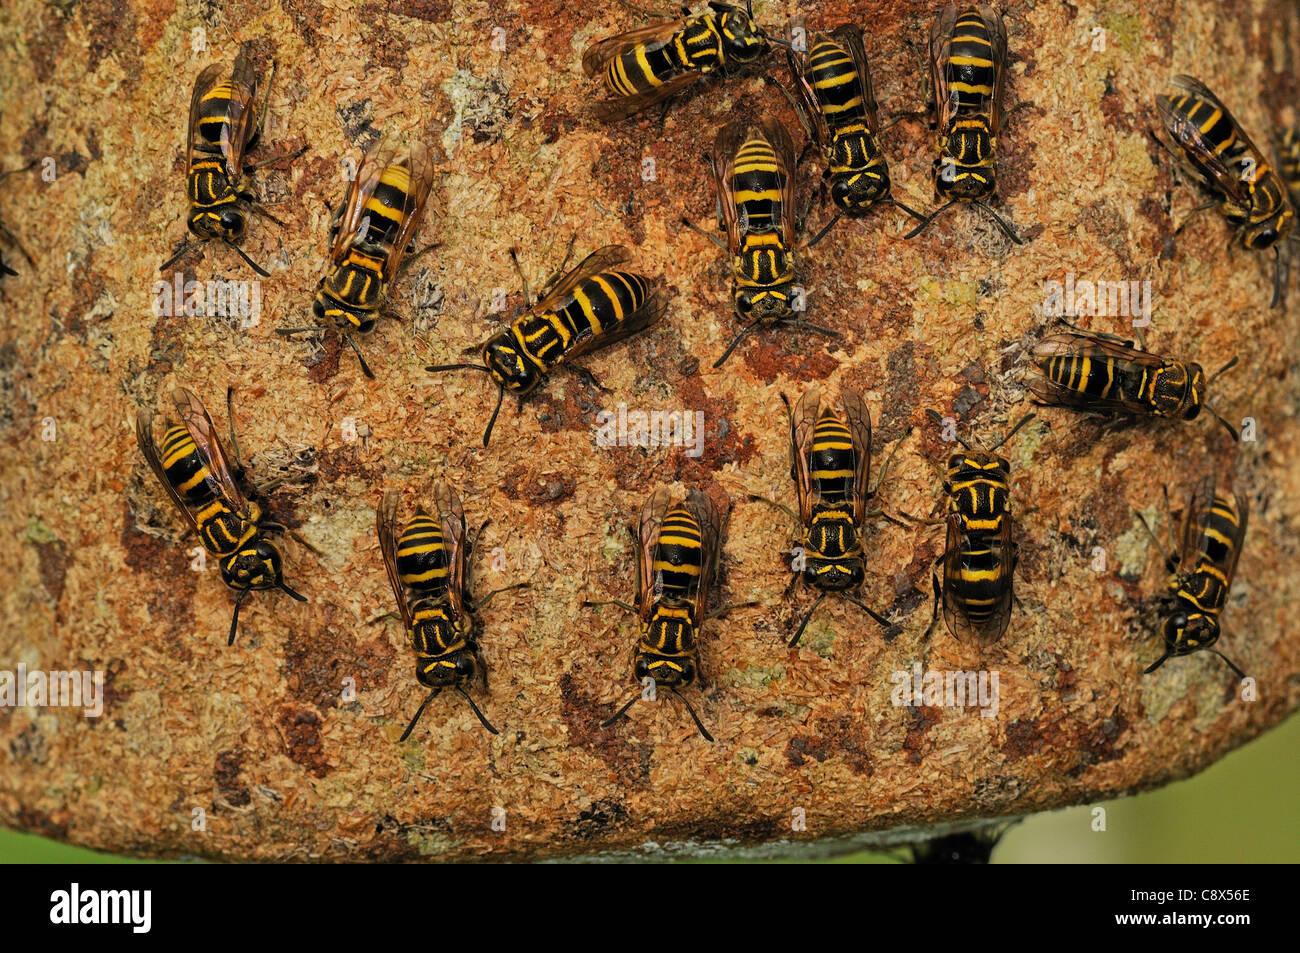 Communal Wasp (Vespidae) several walking on nest surface, Yasuni National Park, Ecuador - Stock Image